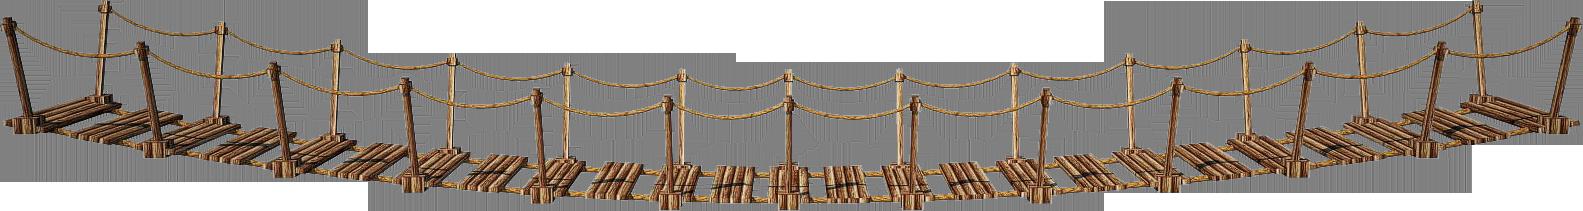 Wooden Bridge 3-A   Suspension Bridge 3-A   PNG by fumar-porros